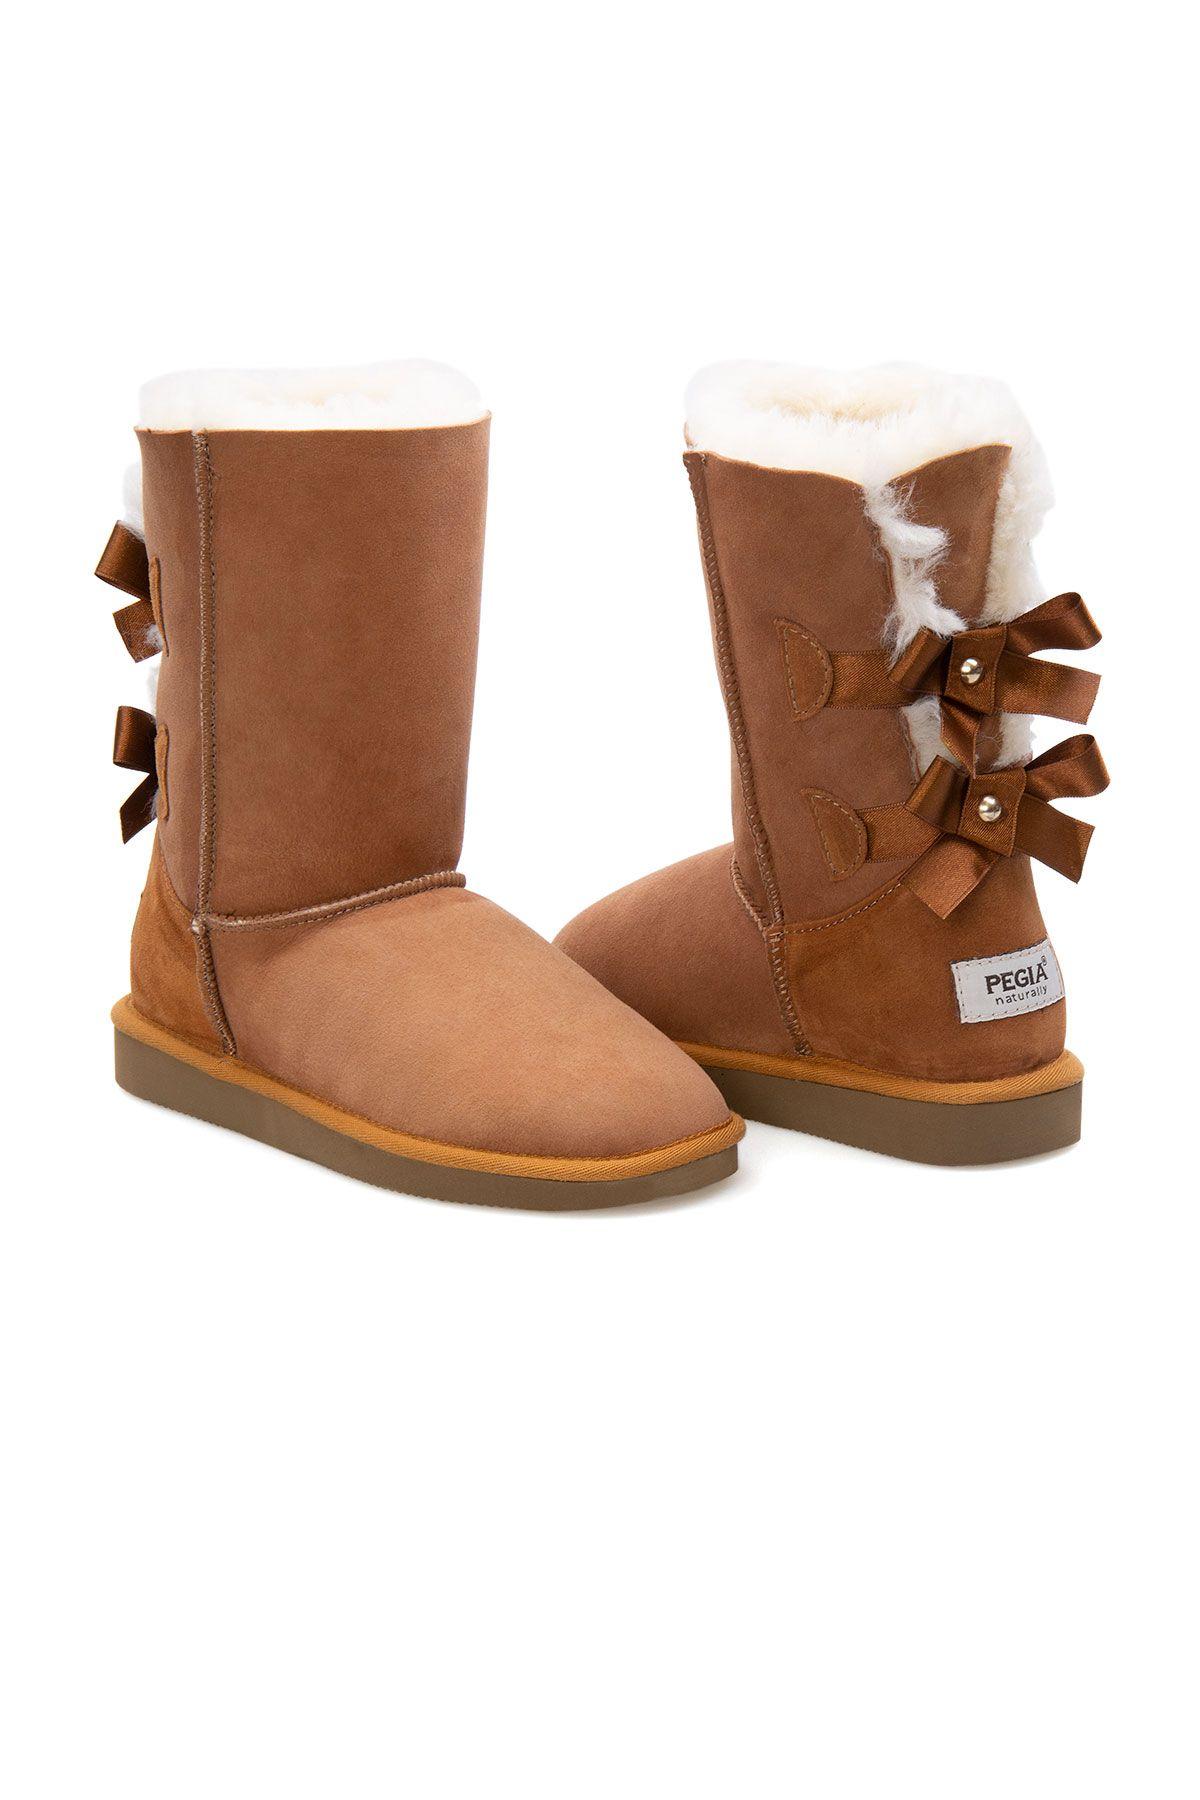 Pegia Genuine Sheepskin Women's Boots 191066 Ginger